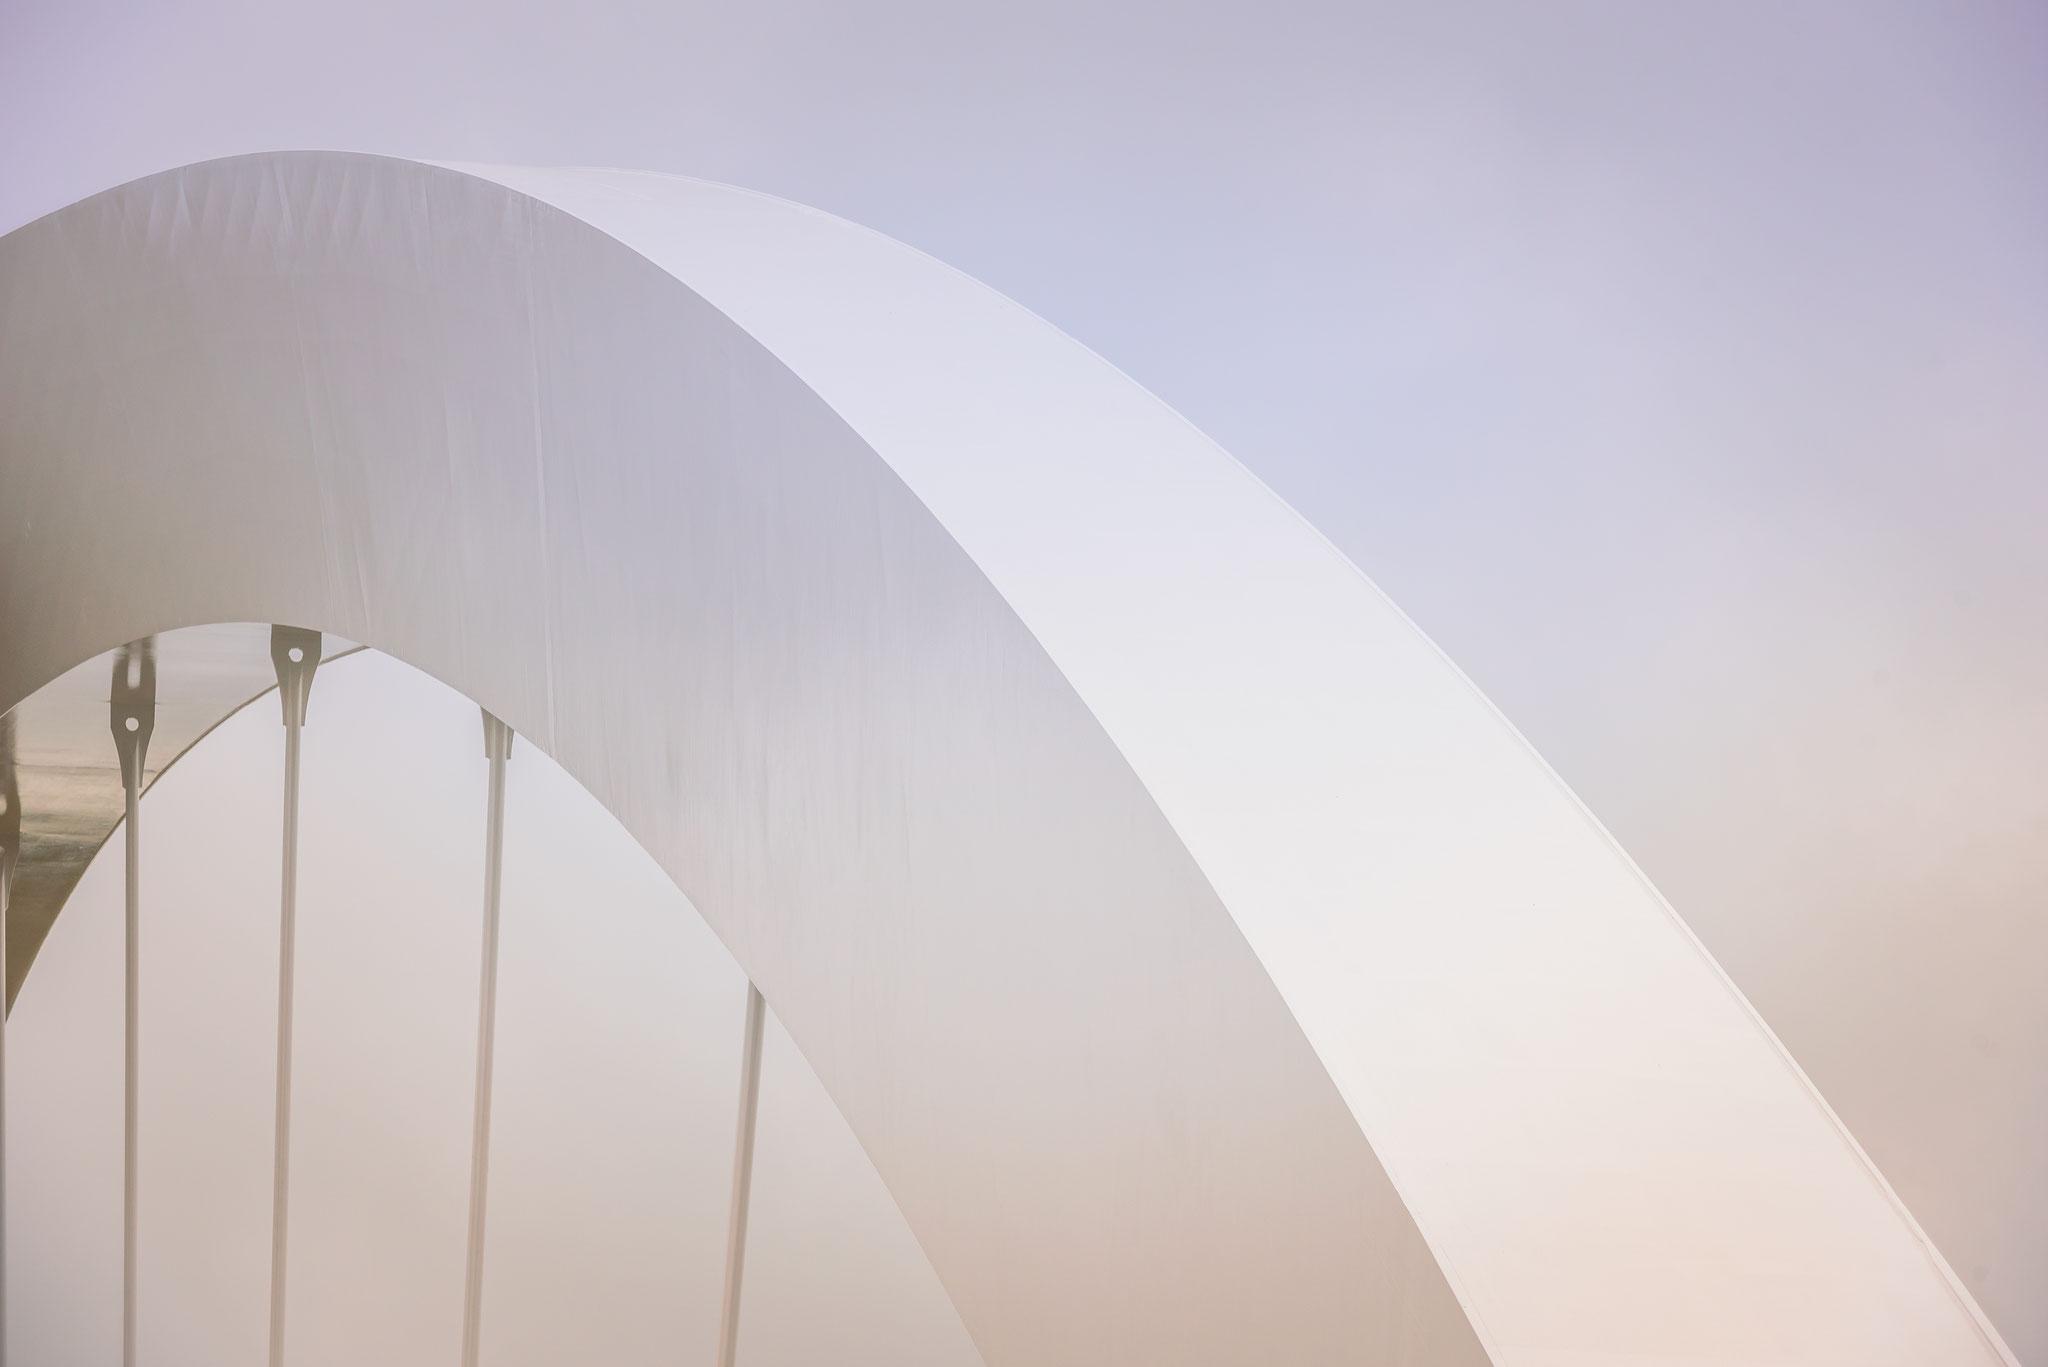 Spoorbrug Zuidhorn